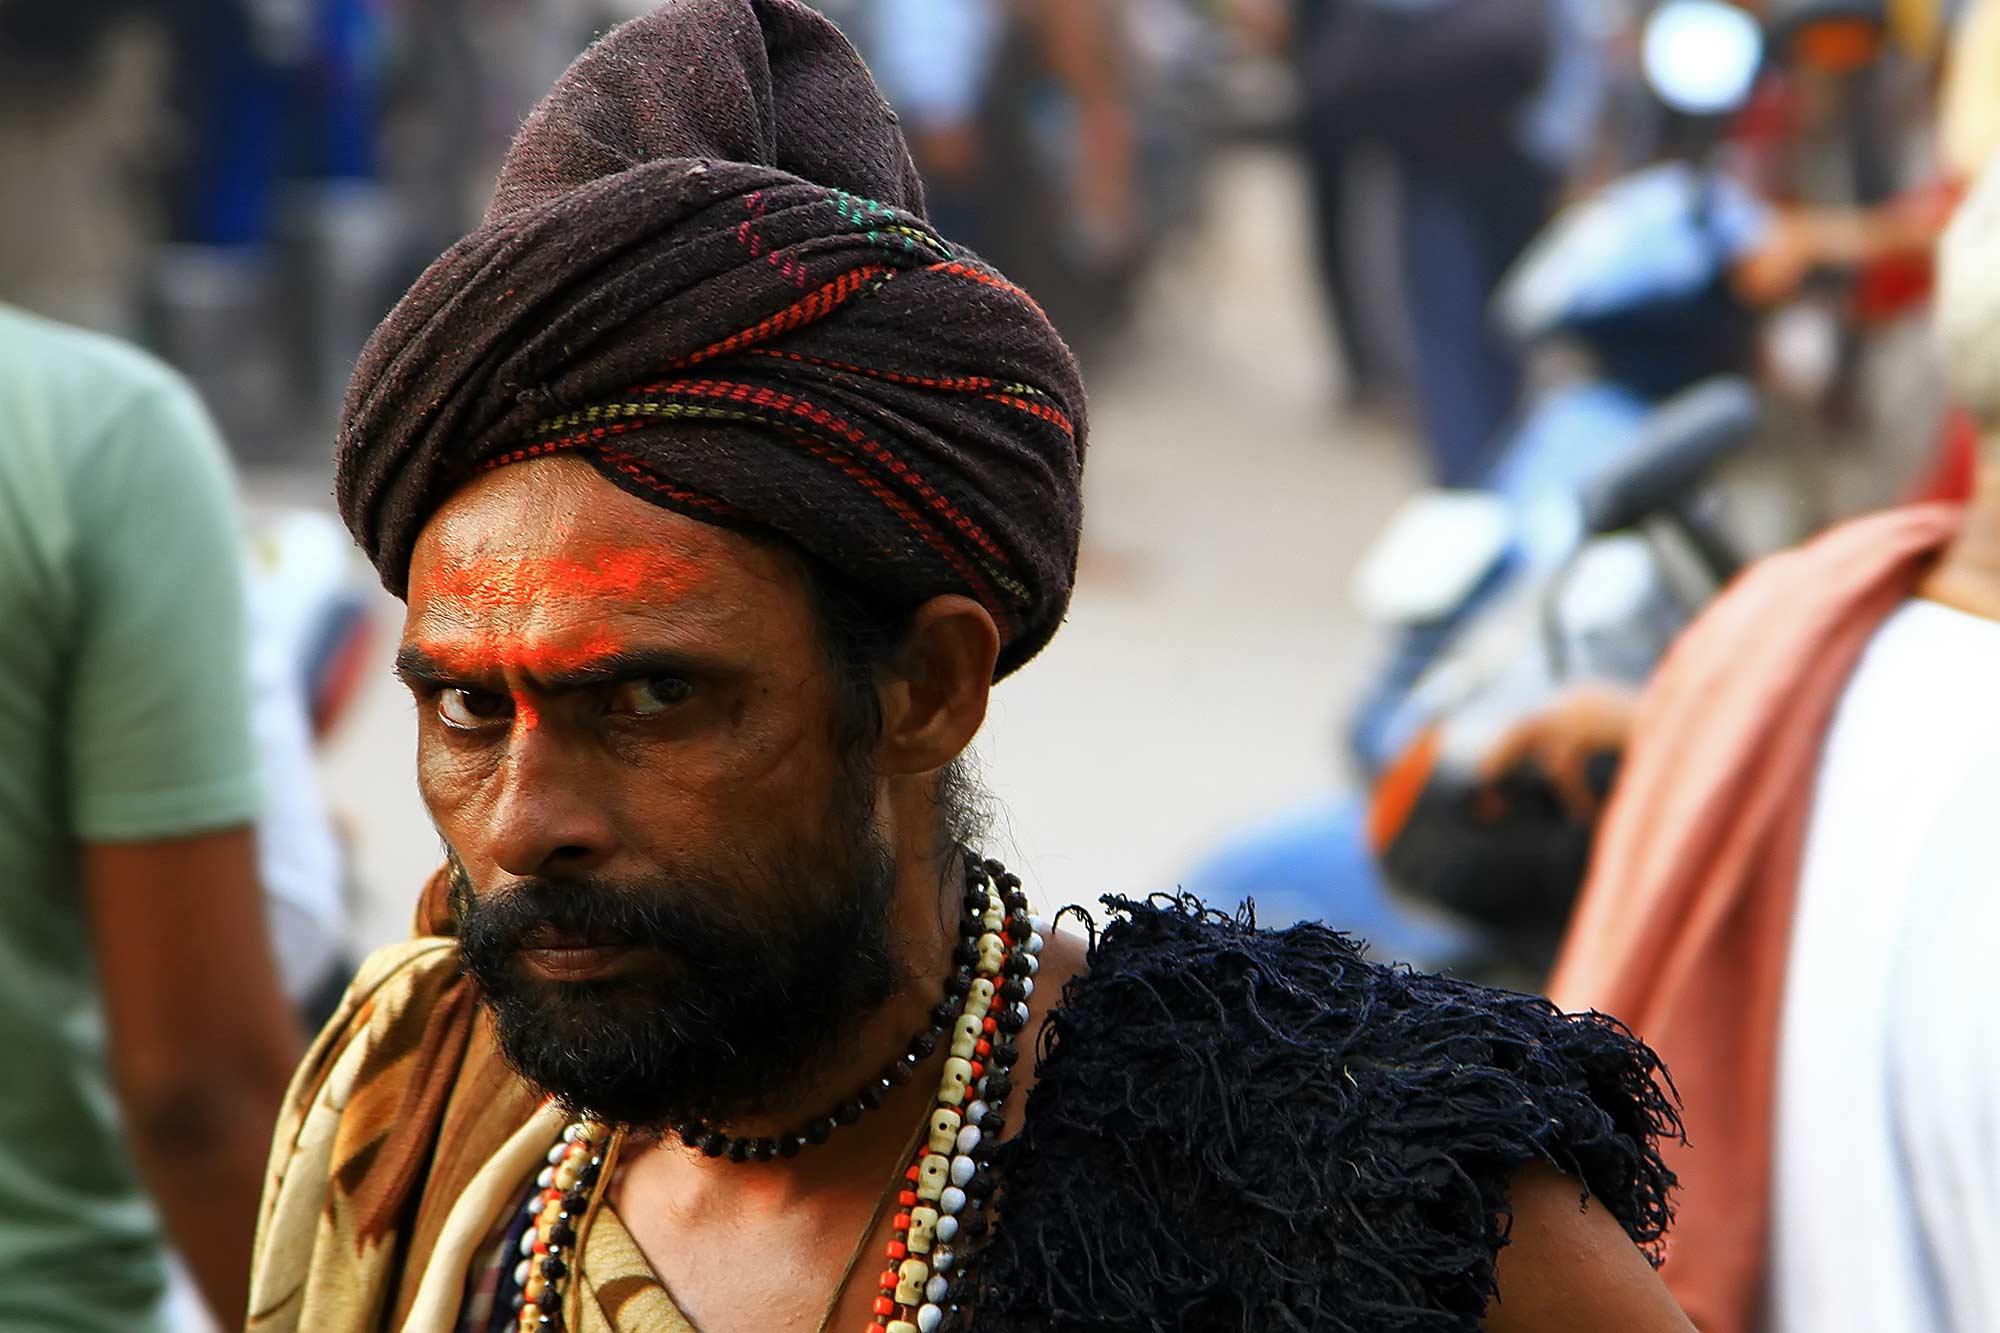 sadhu-man-krishna-festival-varanasi-india